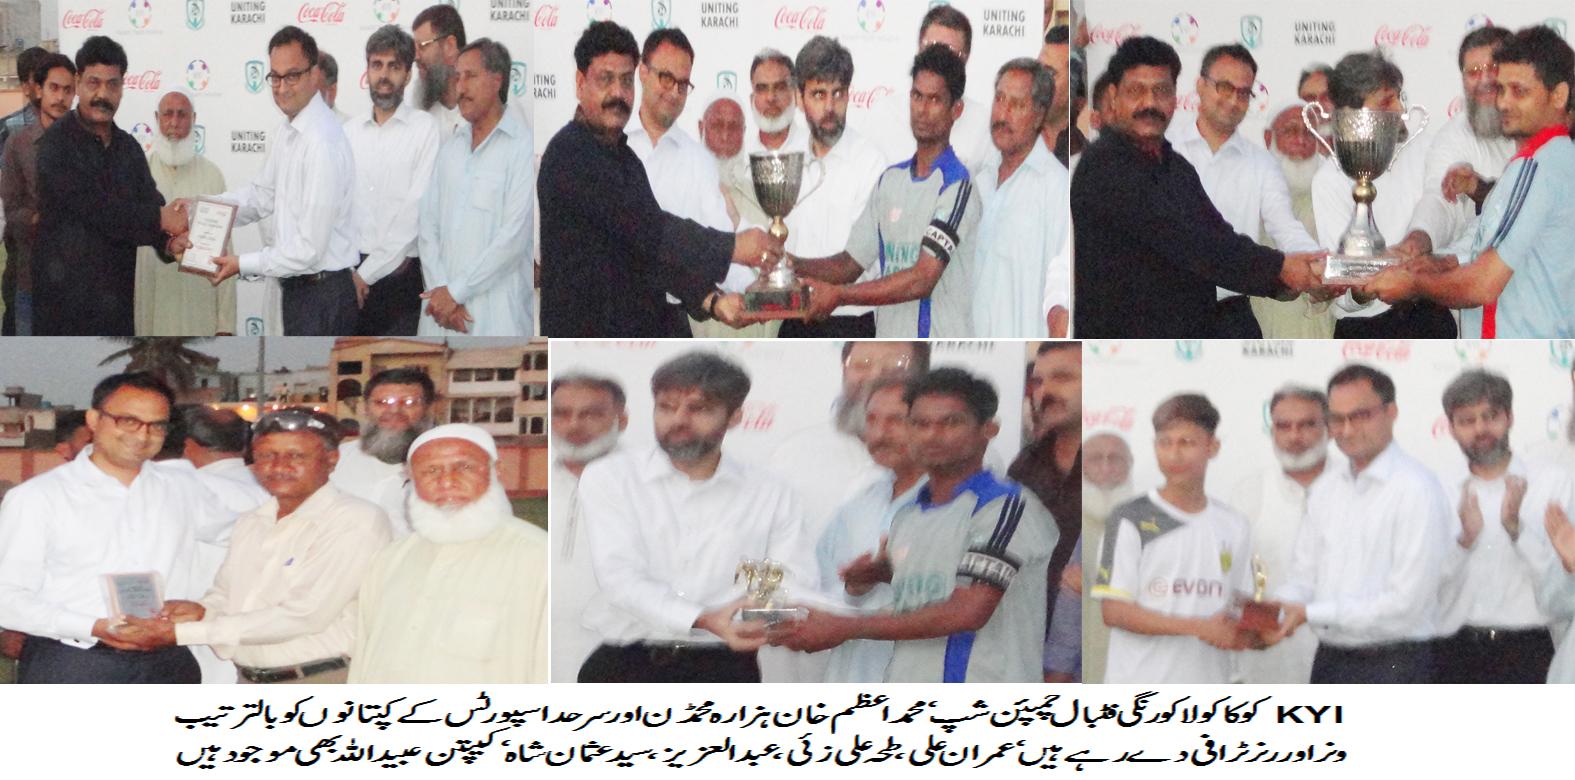 COCA COLA KORANGI CHAMPIONSHIP 2014: Hazara Mohammedan crowned champions